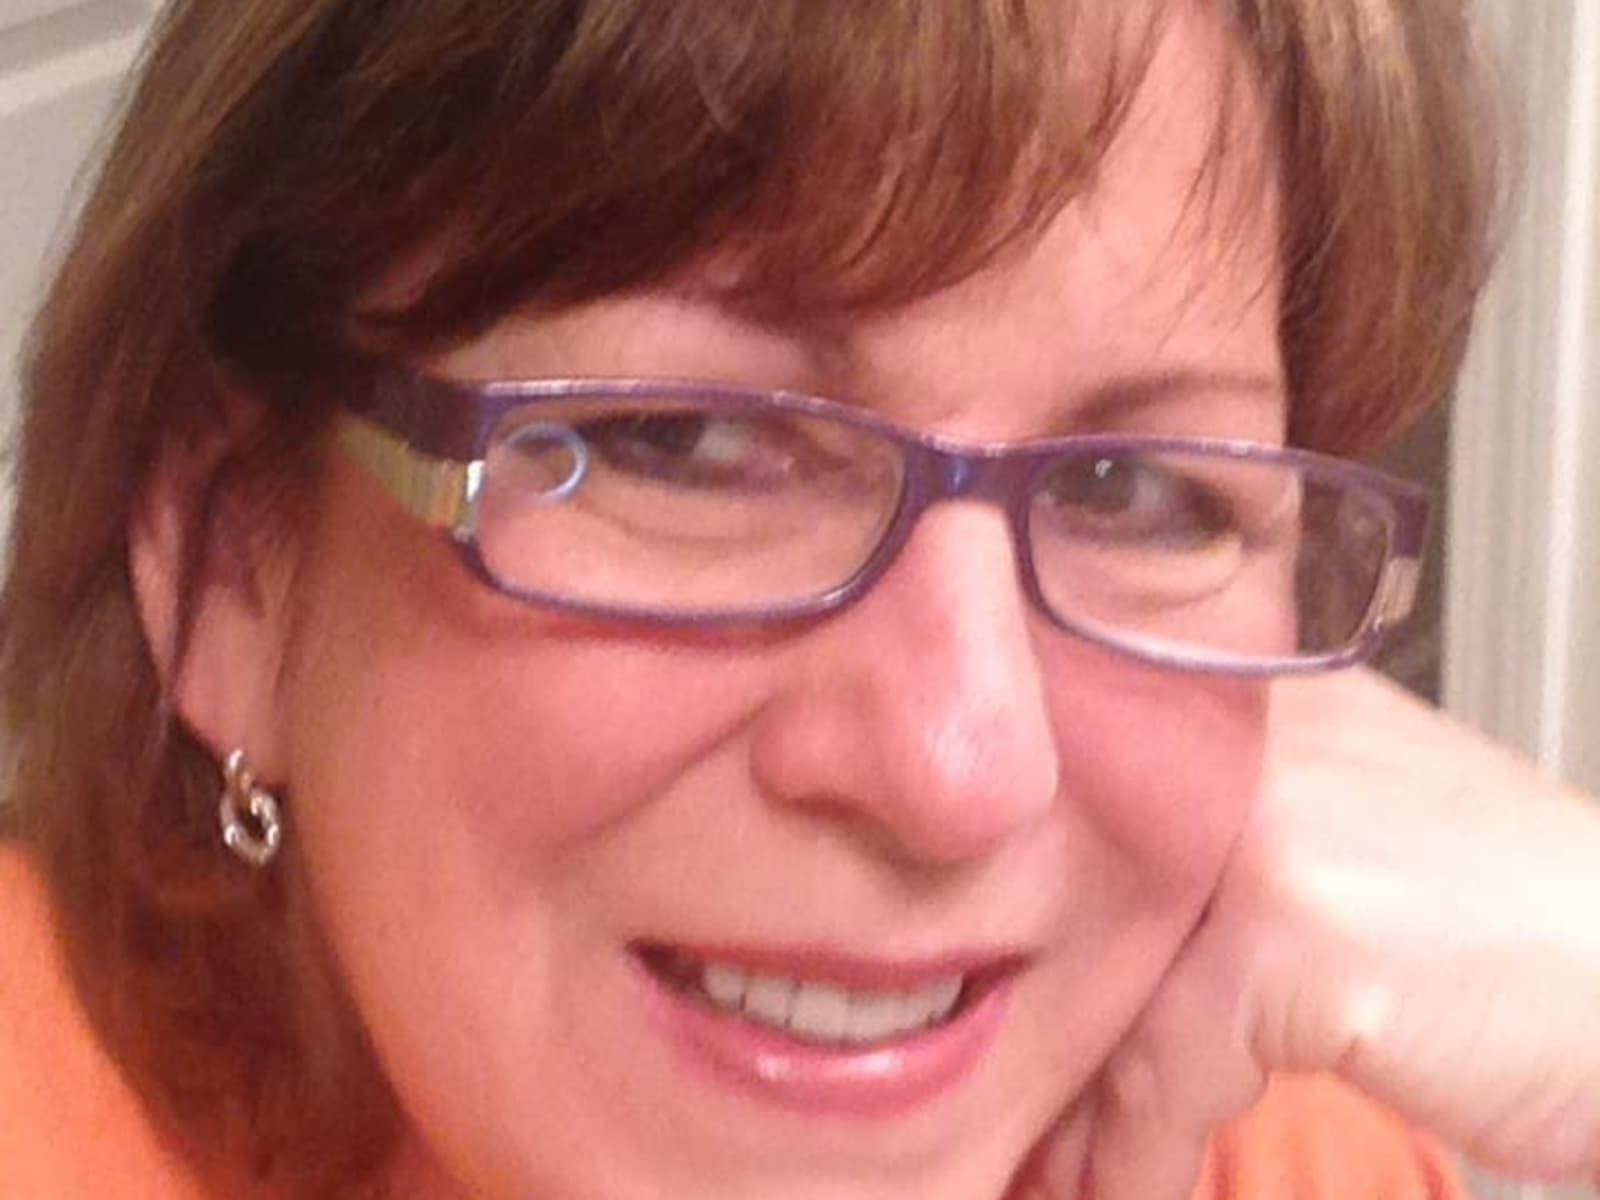 Cindy from Bradenton, Florida, United States